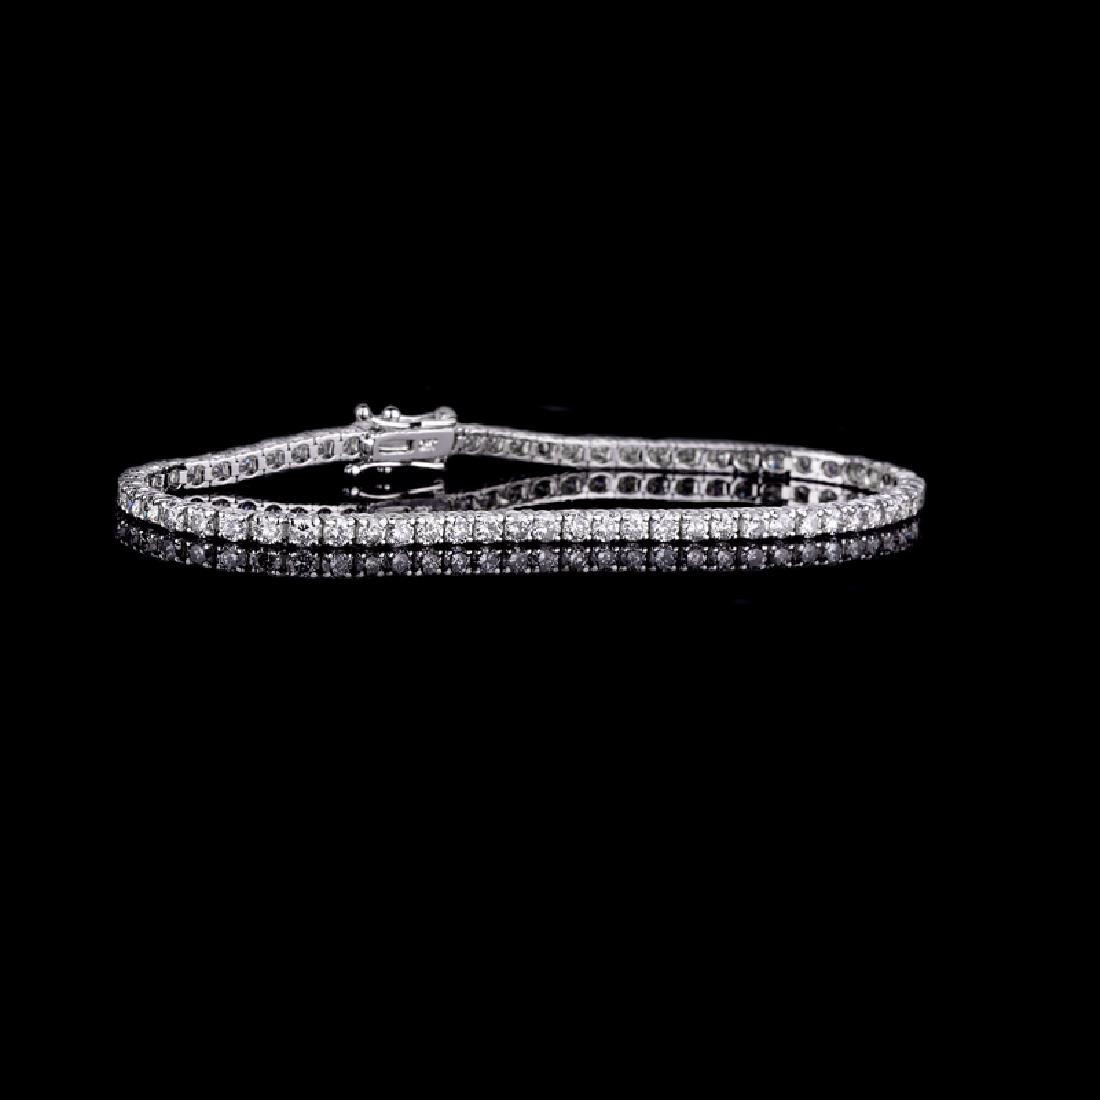 *Fine Jewelry 18 kt. White Gold, Custom Made 3.02CT